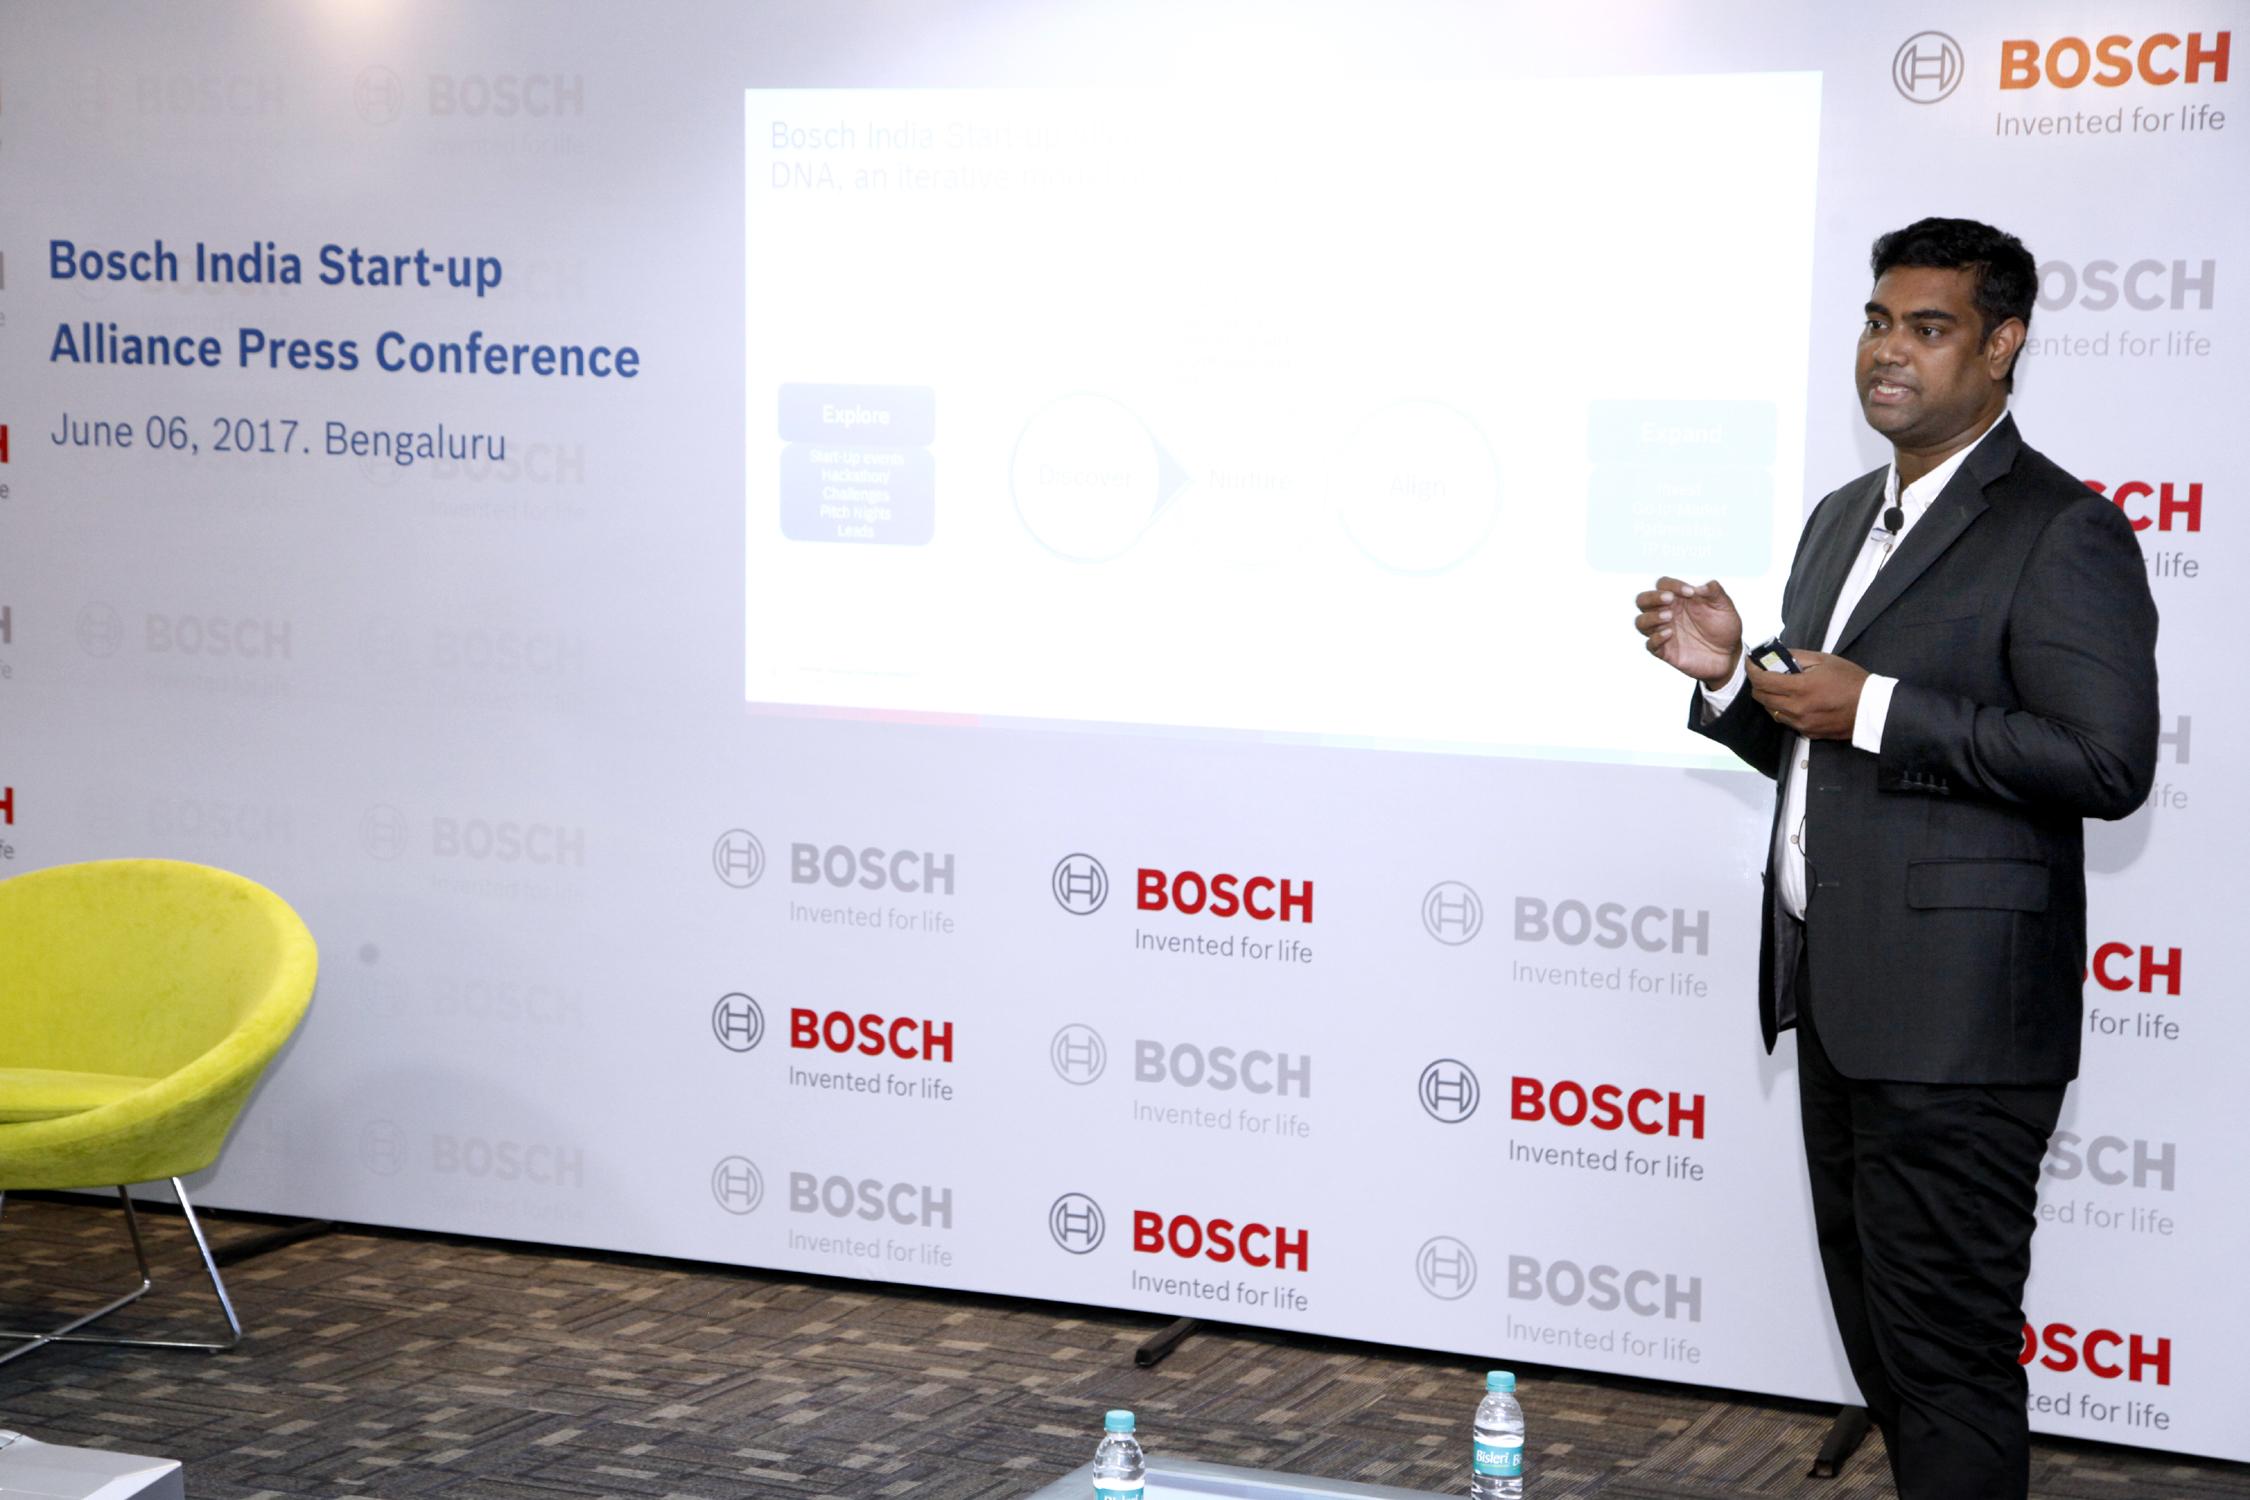 Manohar Esarapu, the head of Bosch India's D.N.A. corporate venture program